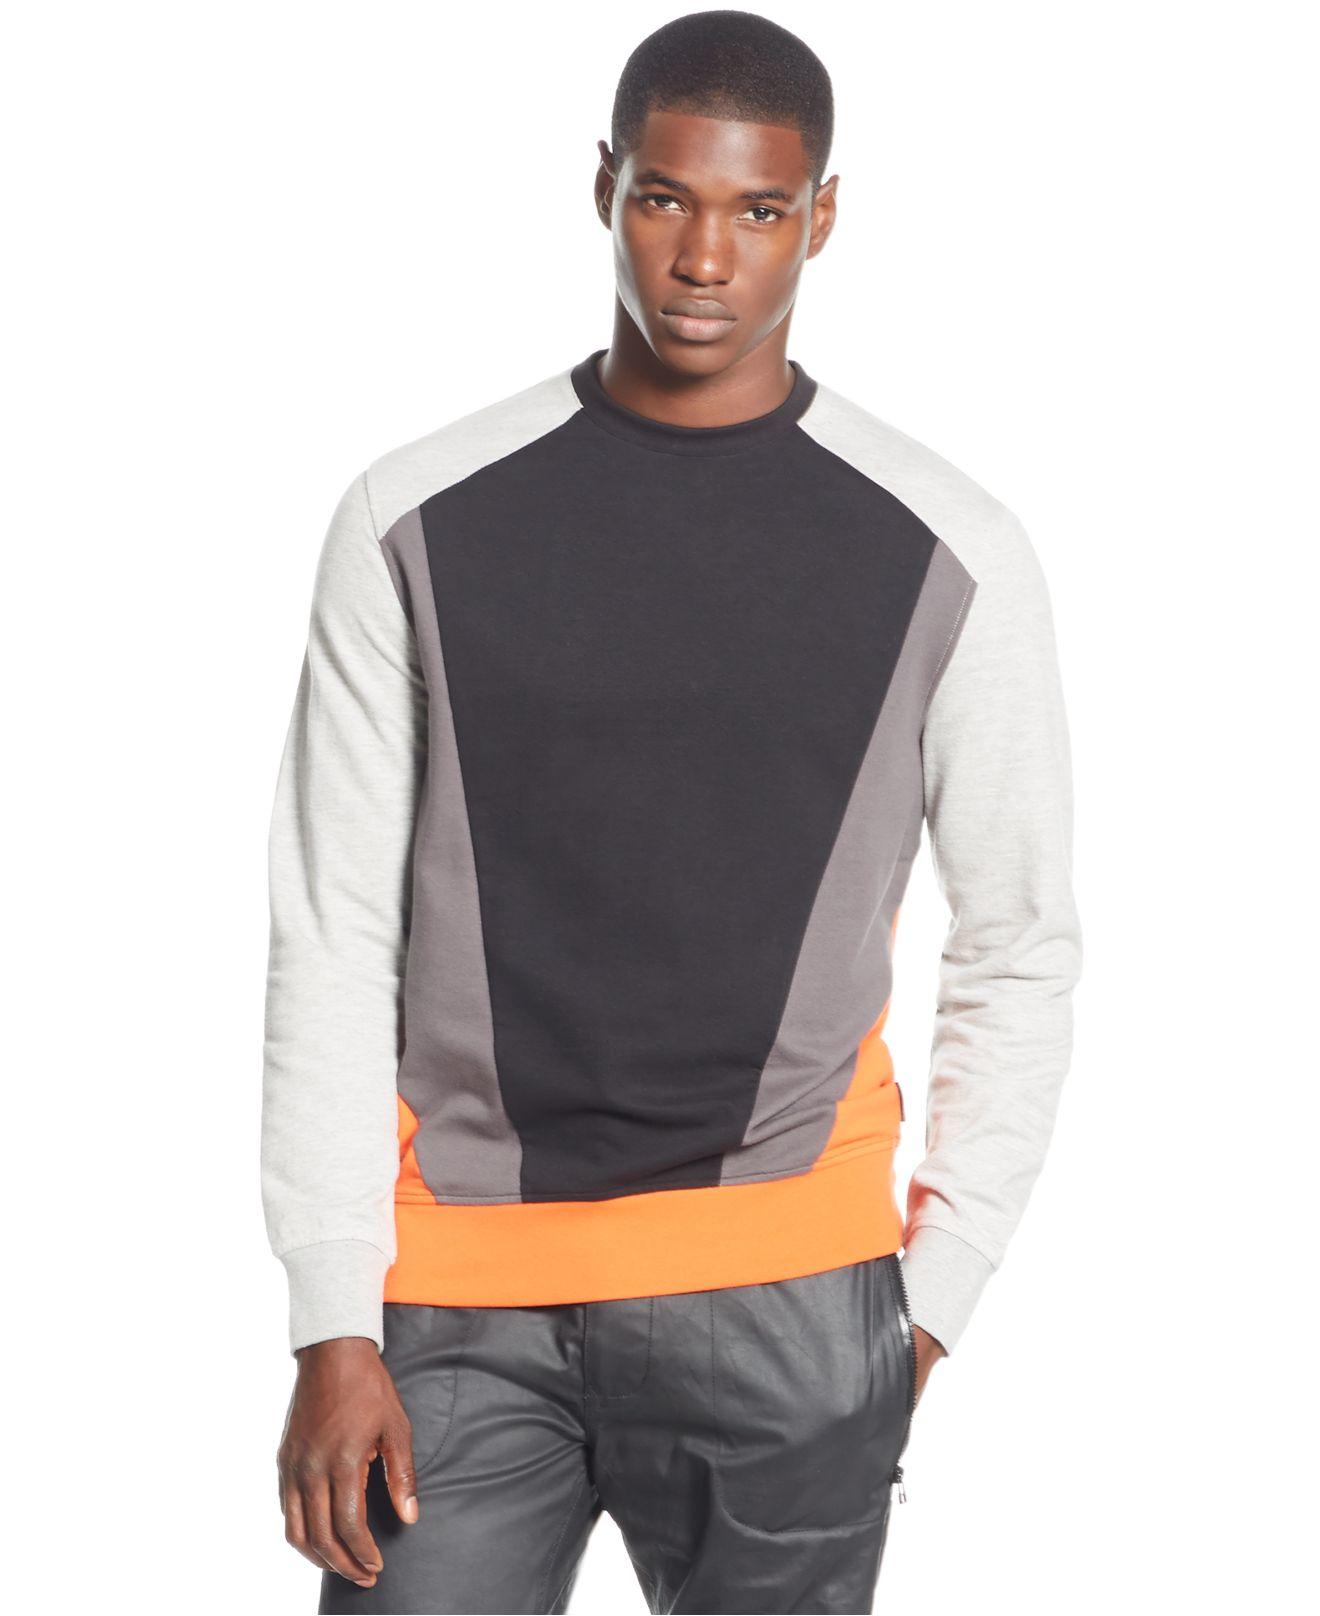 Calvin klein calvin klein long sleeve top in gray for men for Sean john t shirts for mens